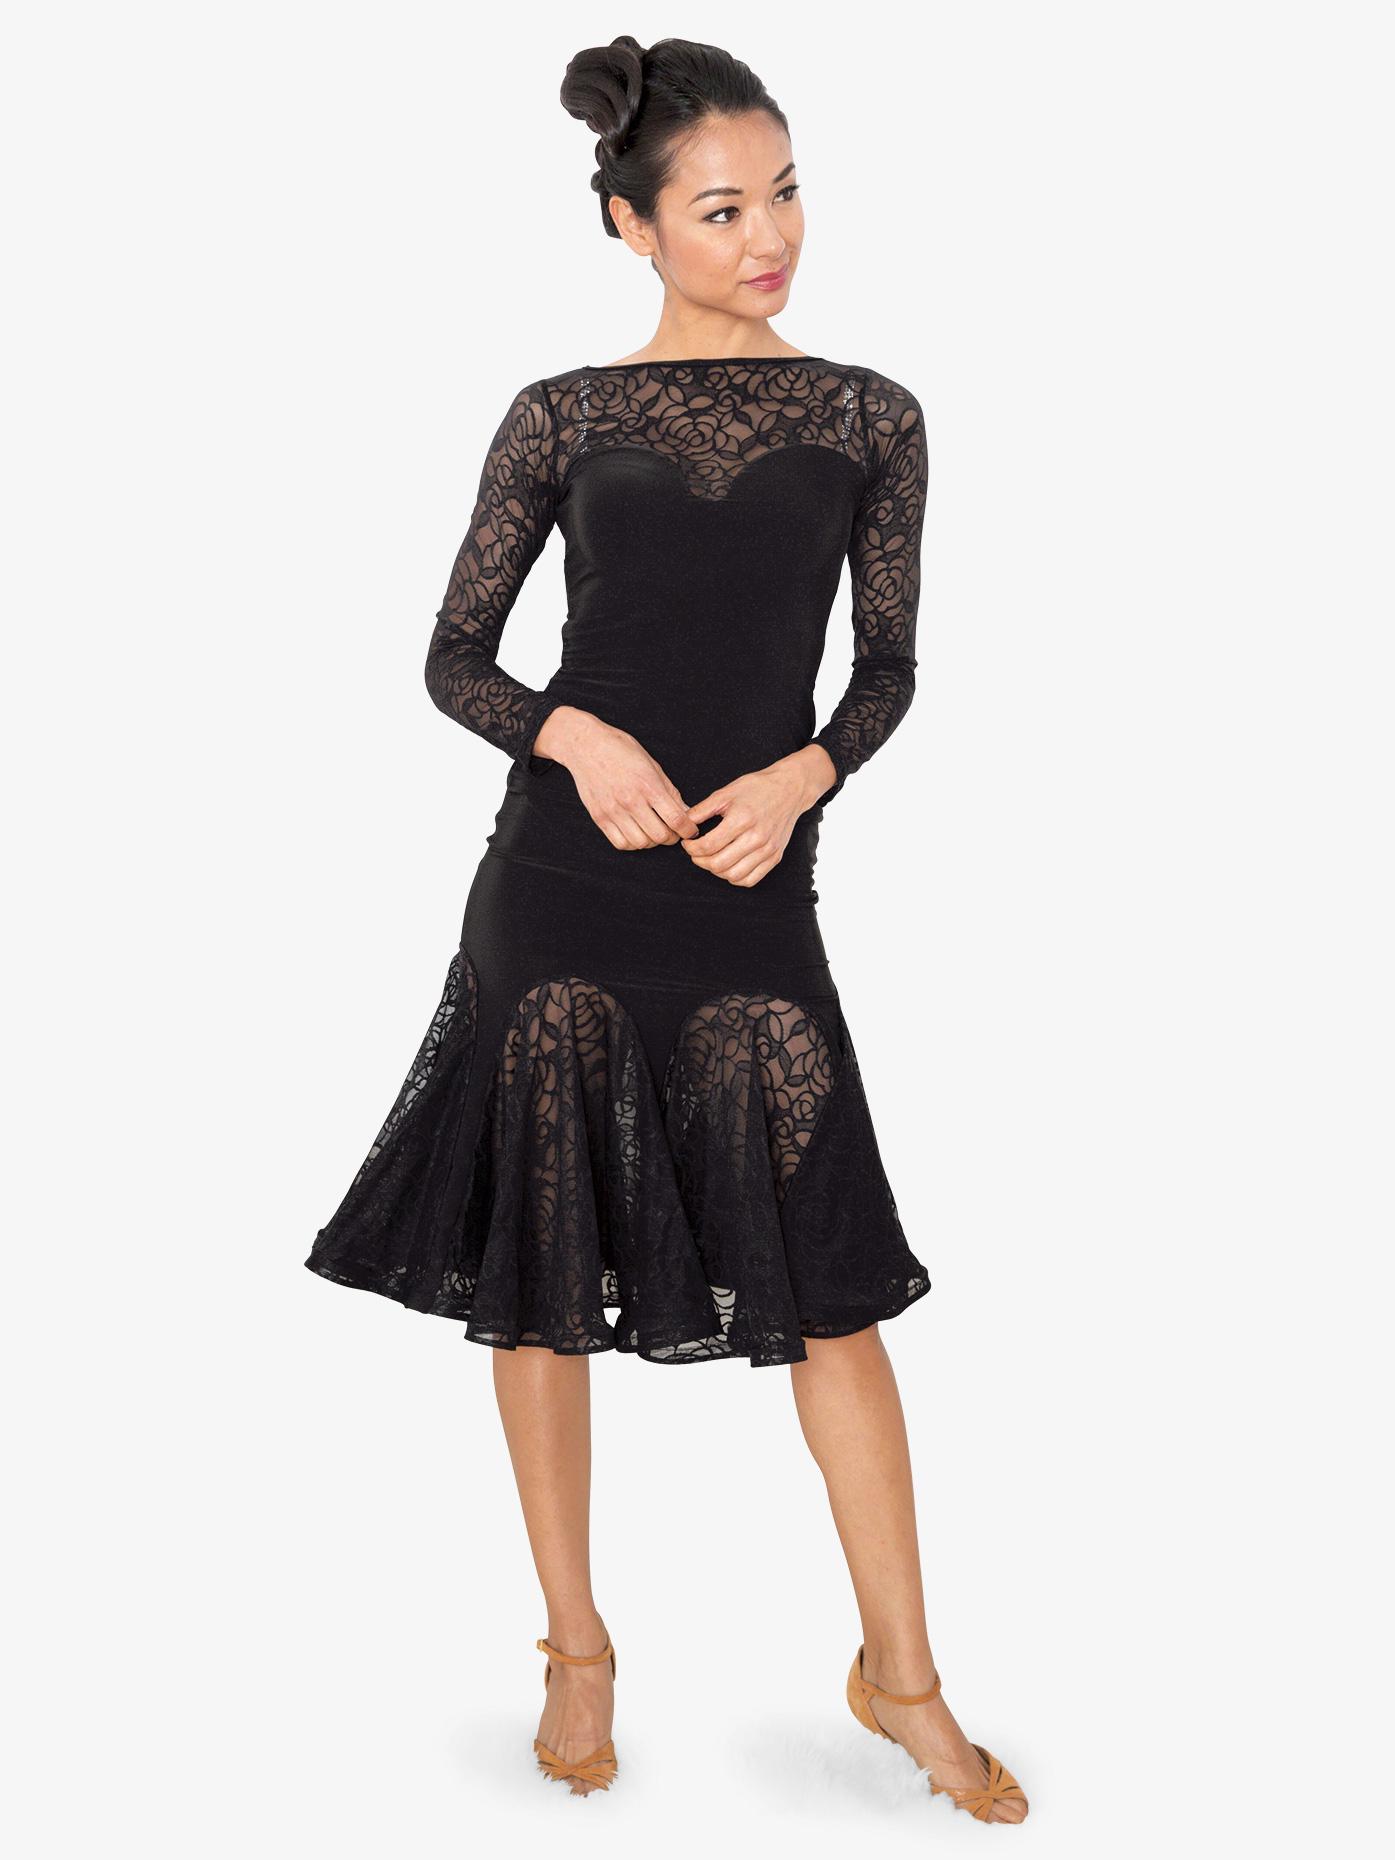 cca719981e1 Womens Short Lace Godet Ballroom Dance Skirt - Style No S814. Loading zoom